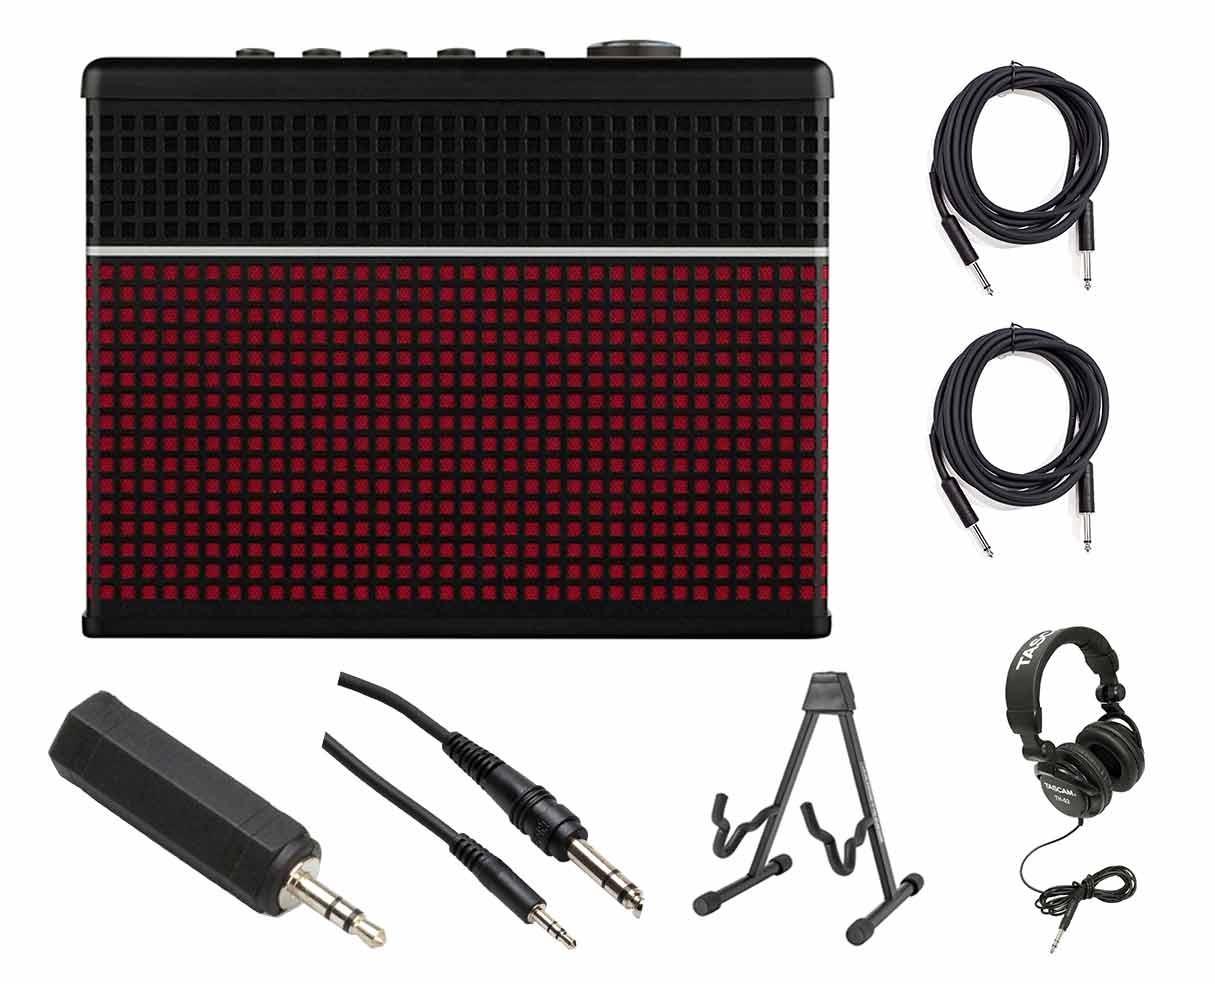 Line 6 Amplifi 30 Compact Stereo Modeling Amp Bonus Bundle